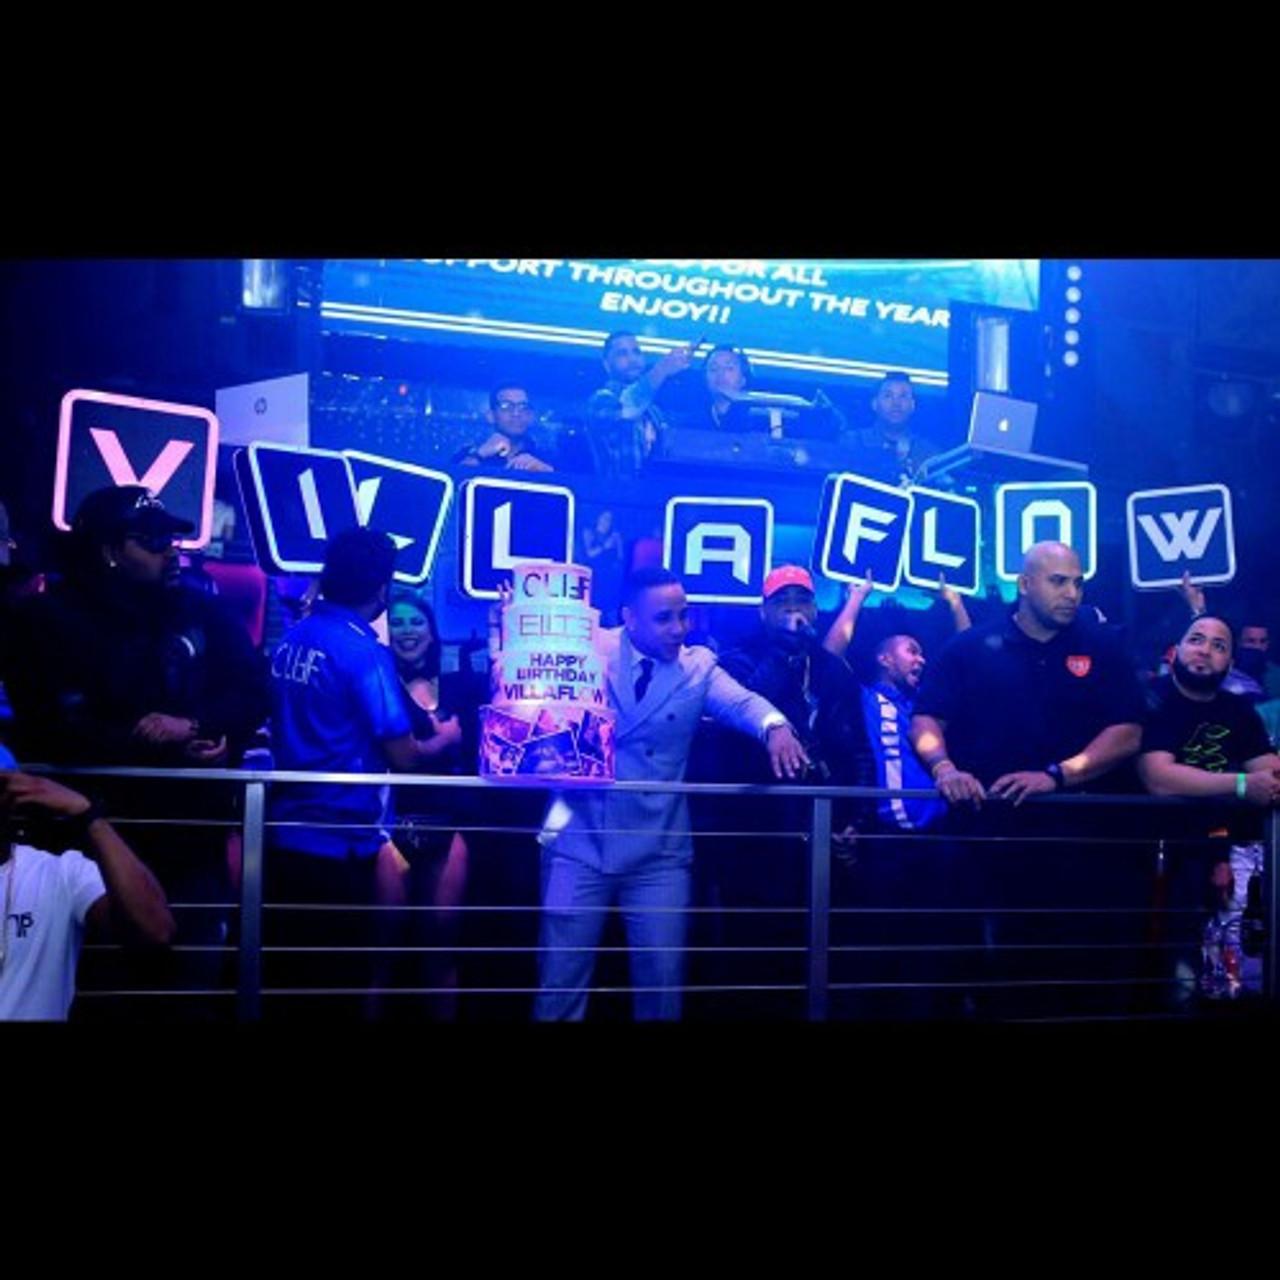 vip-nightclubshop-name-lettersshield-birthday-vip-name-changer-interchangeable-letter-box-shield-presenter-cake-promo-nightclub.JPGdisplay-500x500